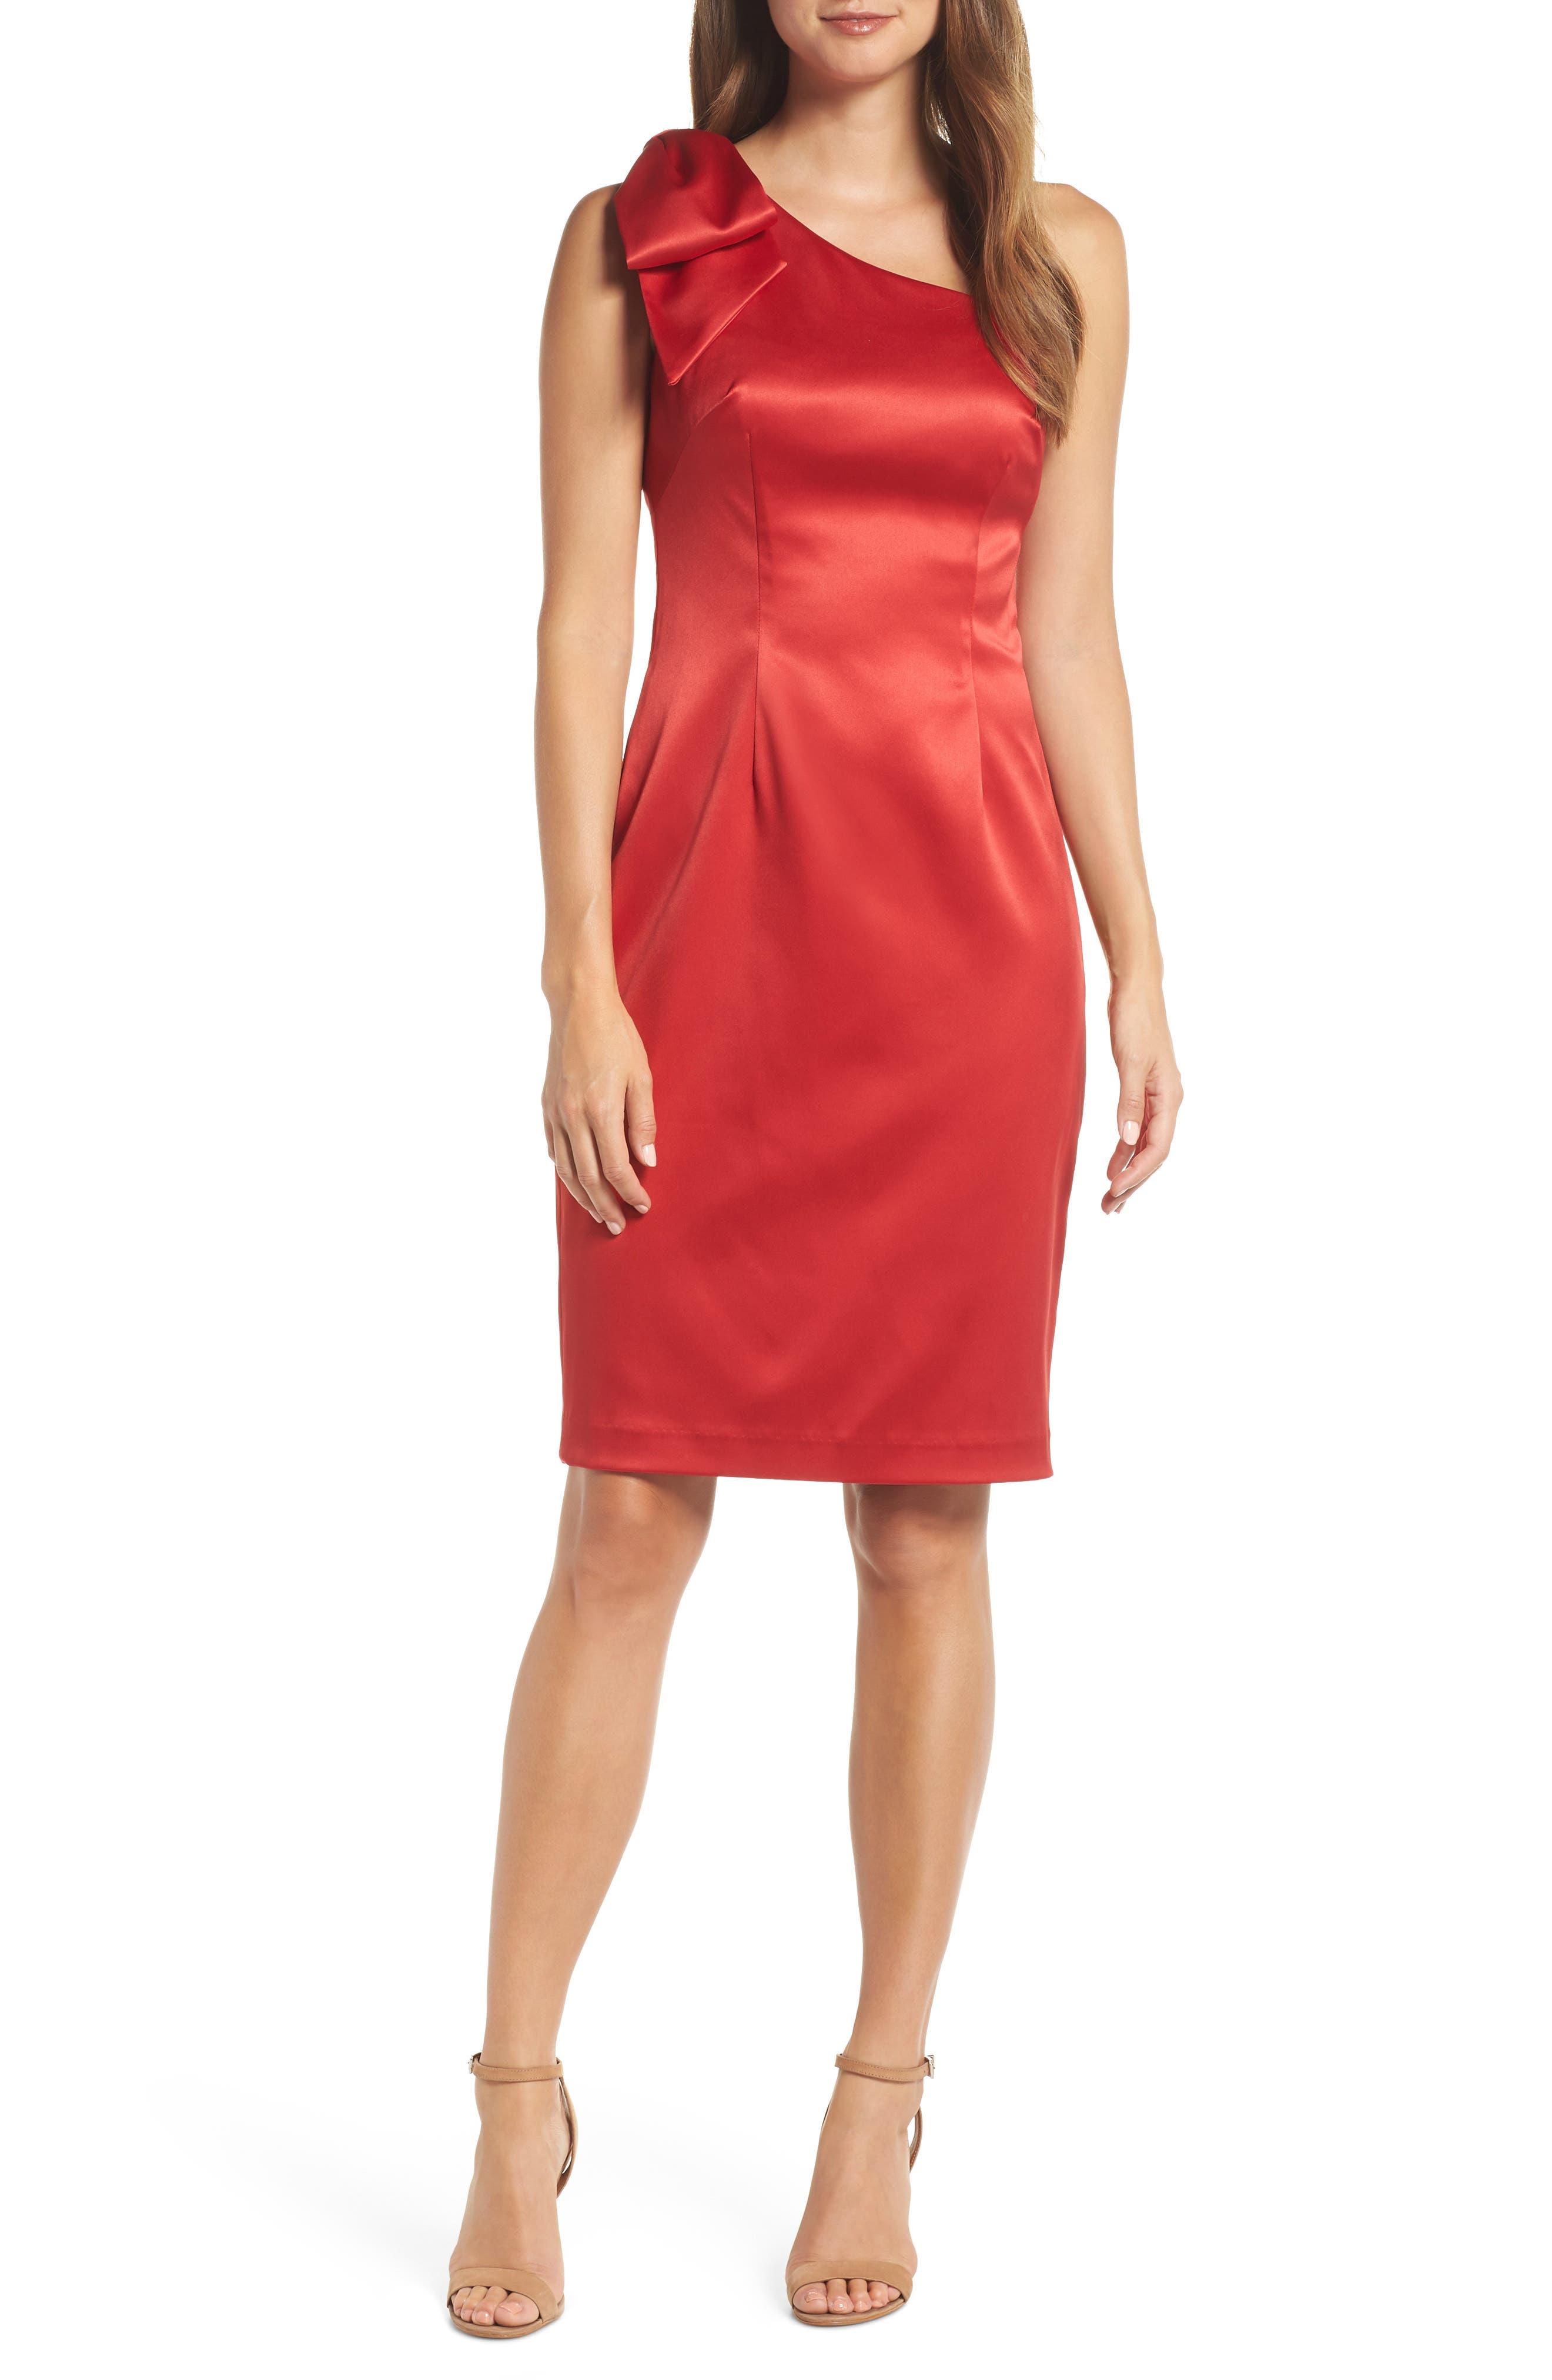 80s Dresses | Casual to Party Dresses Womens Eliza J One-Shoulder Bow Detail Satin Sheath Dress Size 14 - Red $138.00 AT vintagedancer.com